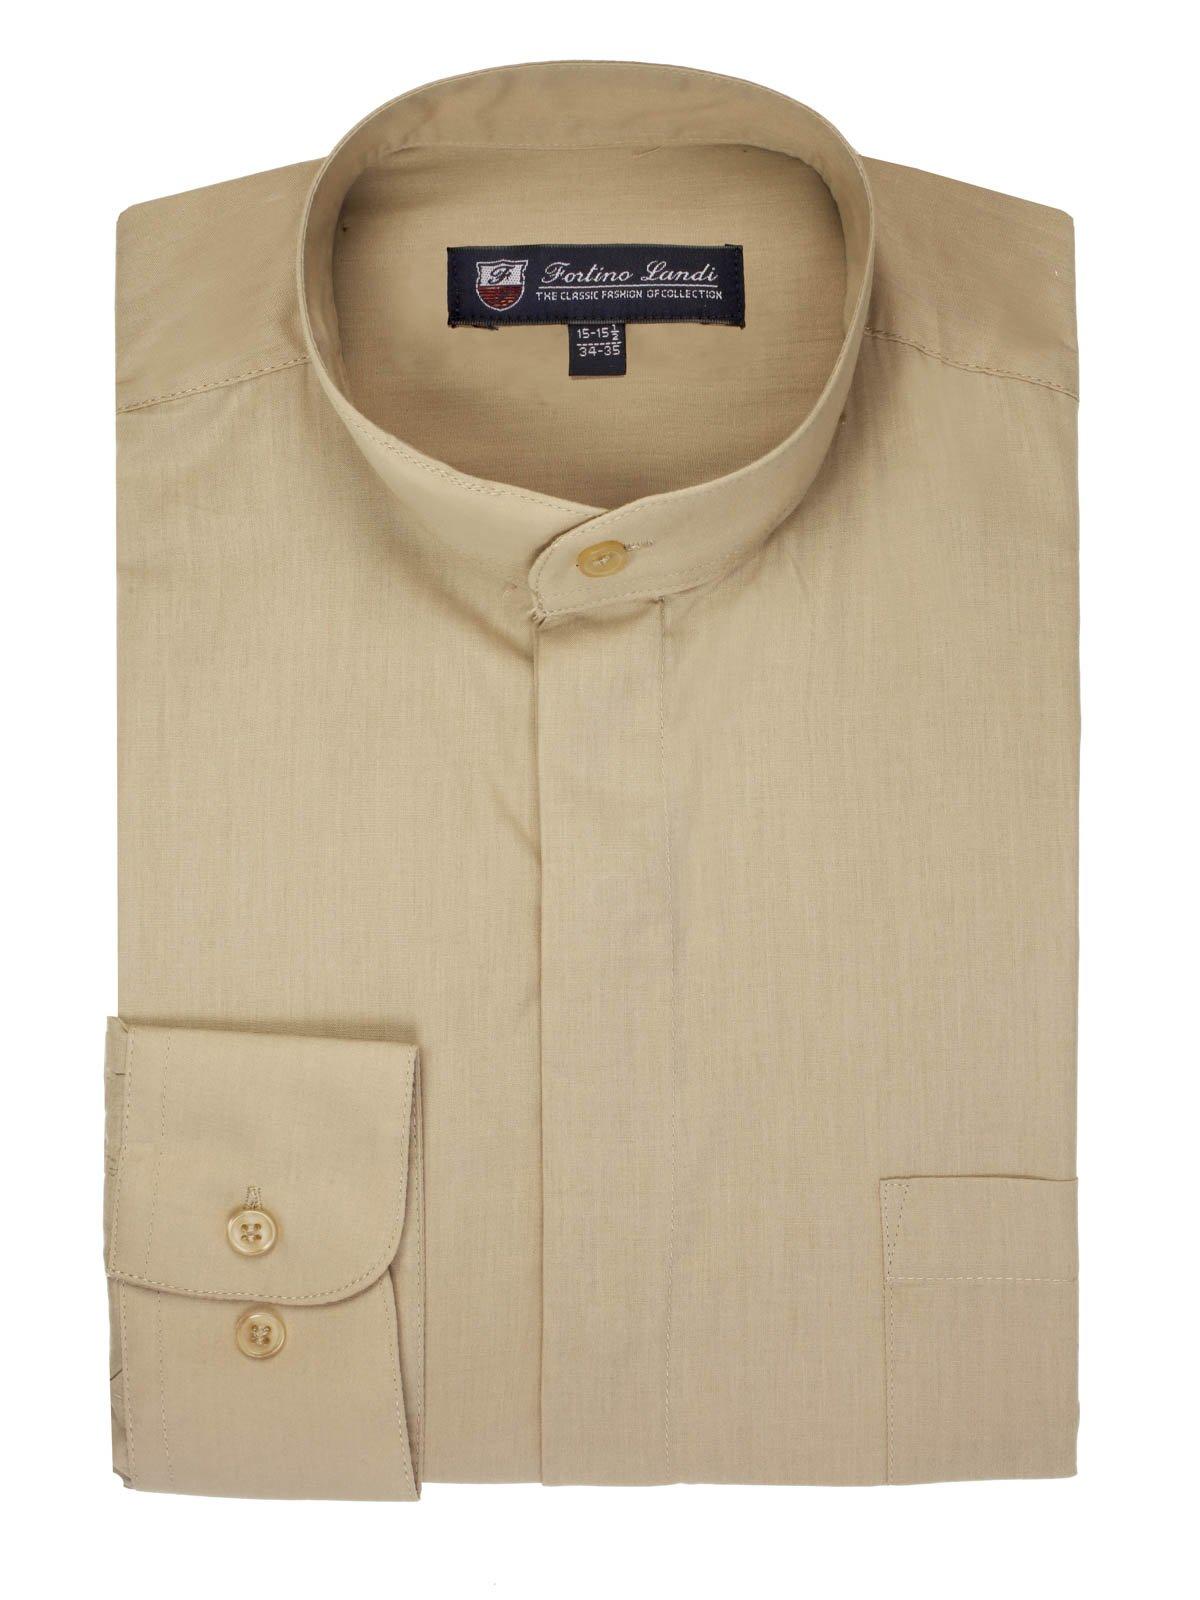 FORTINO LANDI Men's Long-Sleeve Banded Collar Shirt - Khaki Medium(15-15.5 Neck) Sleeve 34/35